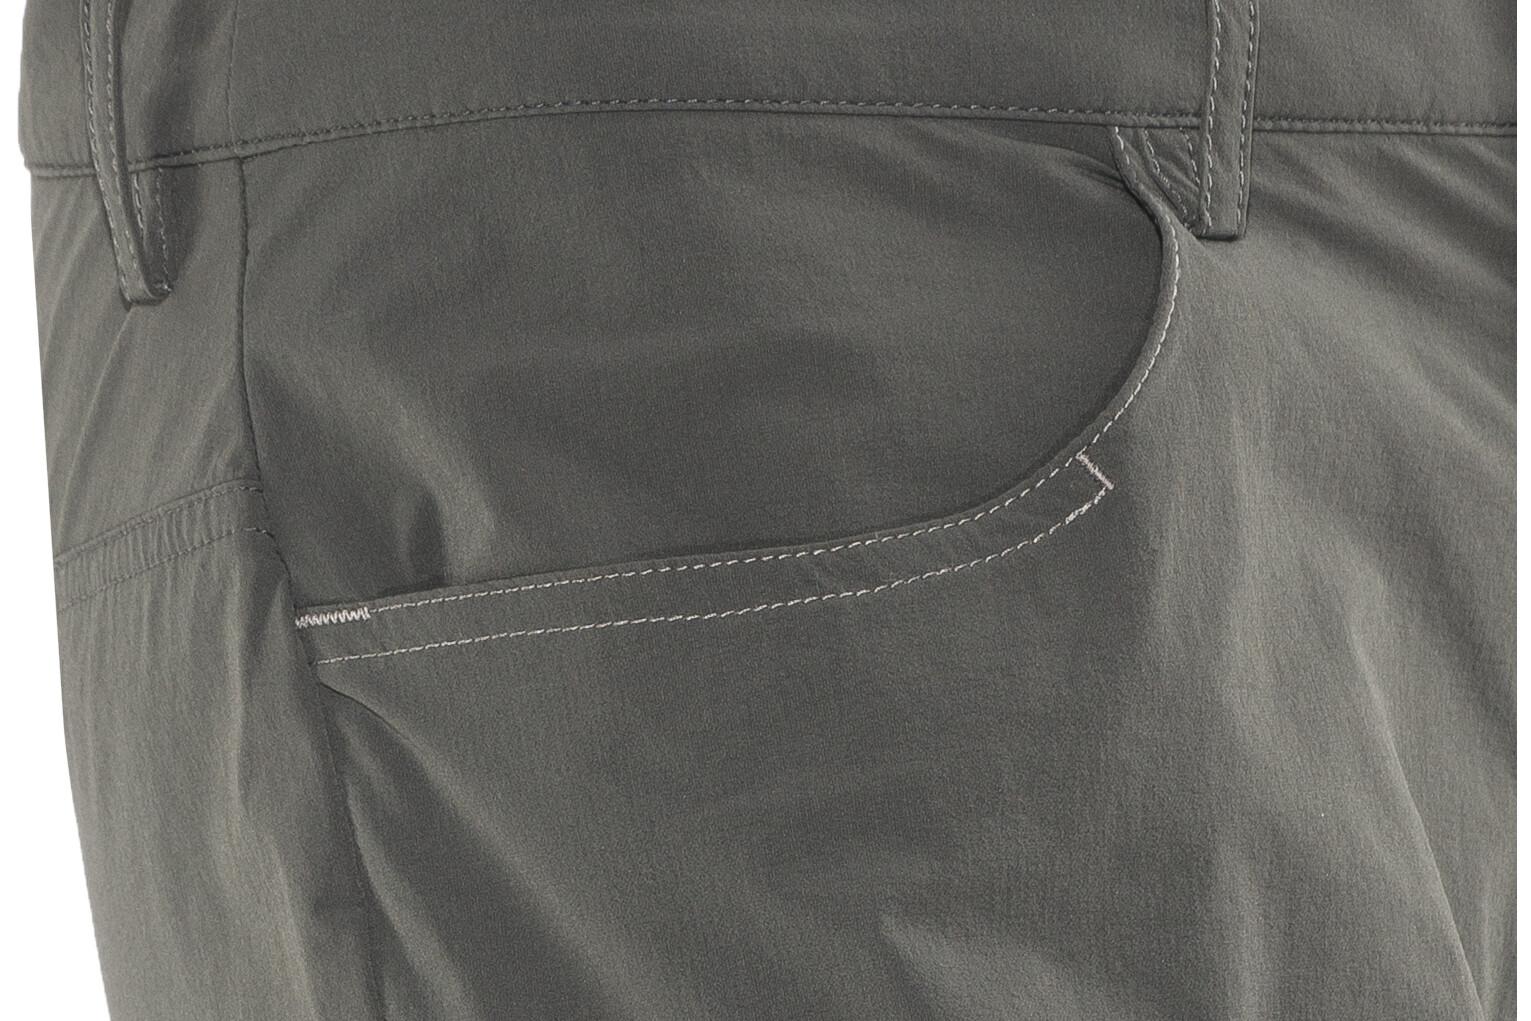 5b724de6 Bergans Moa Bukser Damer, solid charcoal/solid grey   Find ...